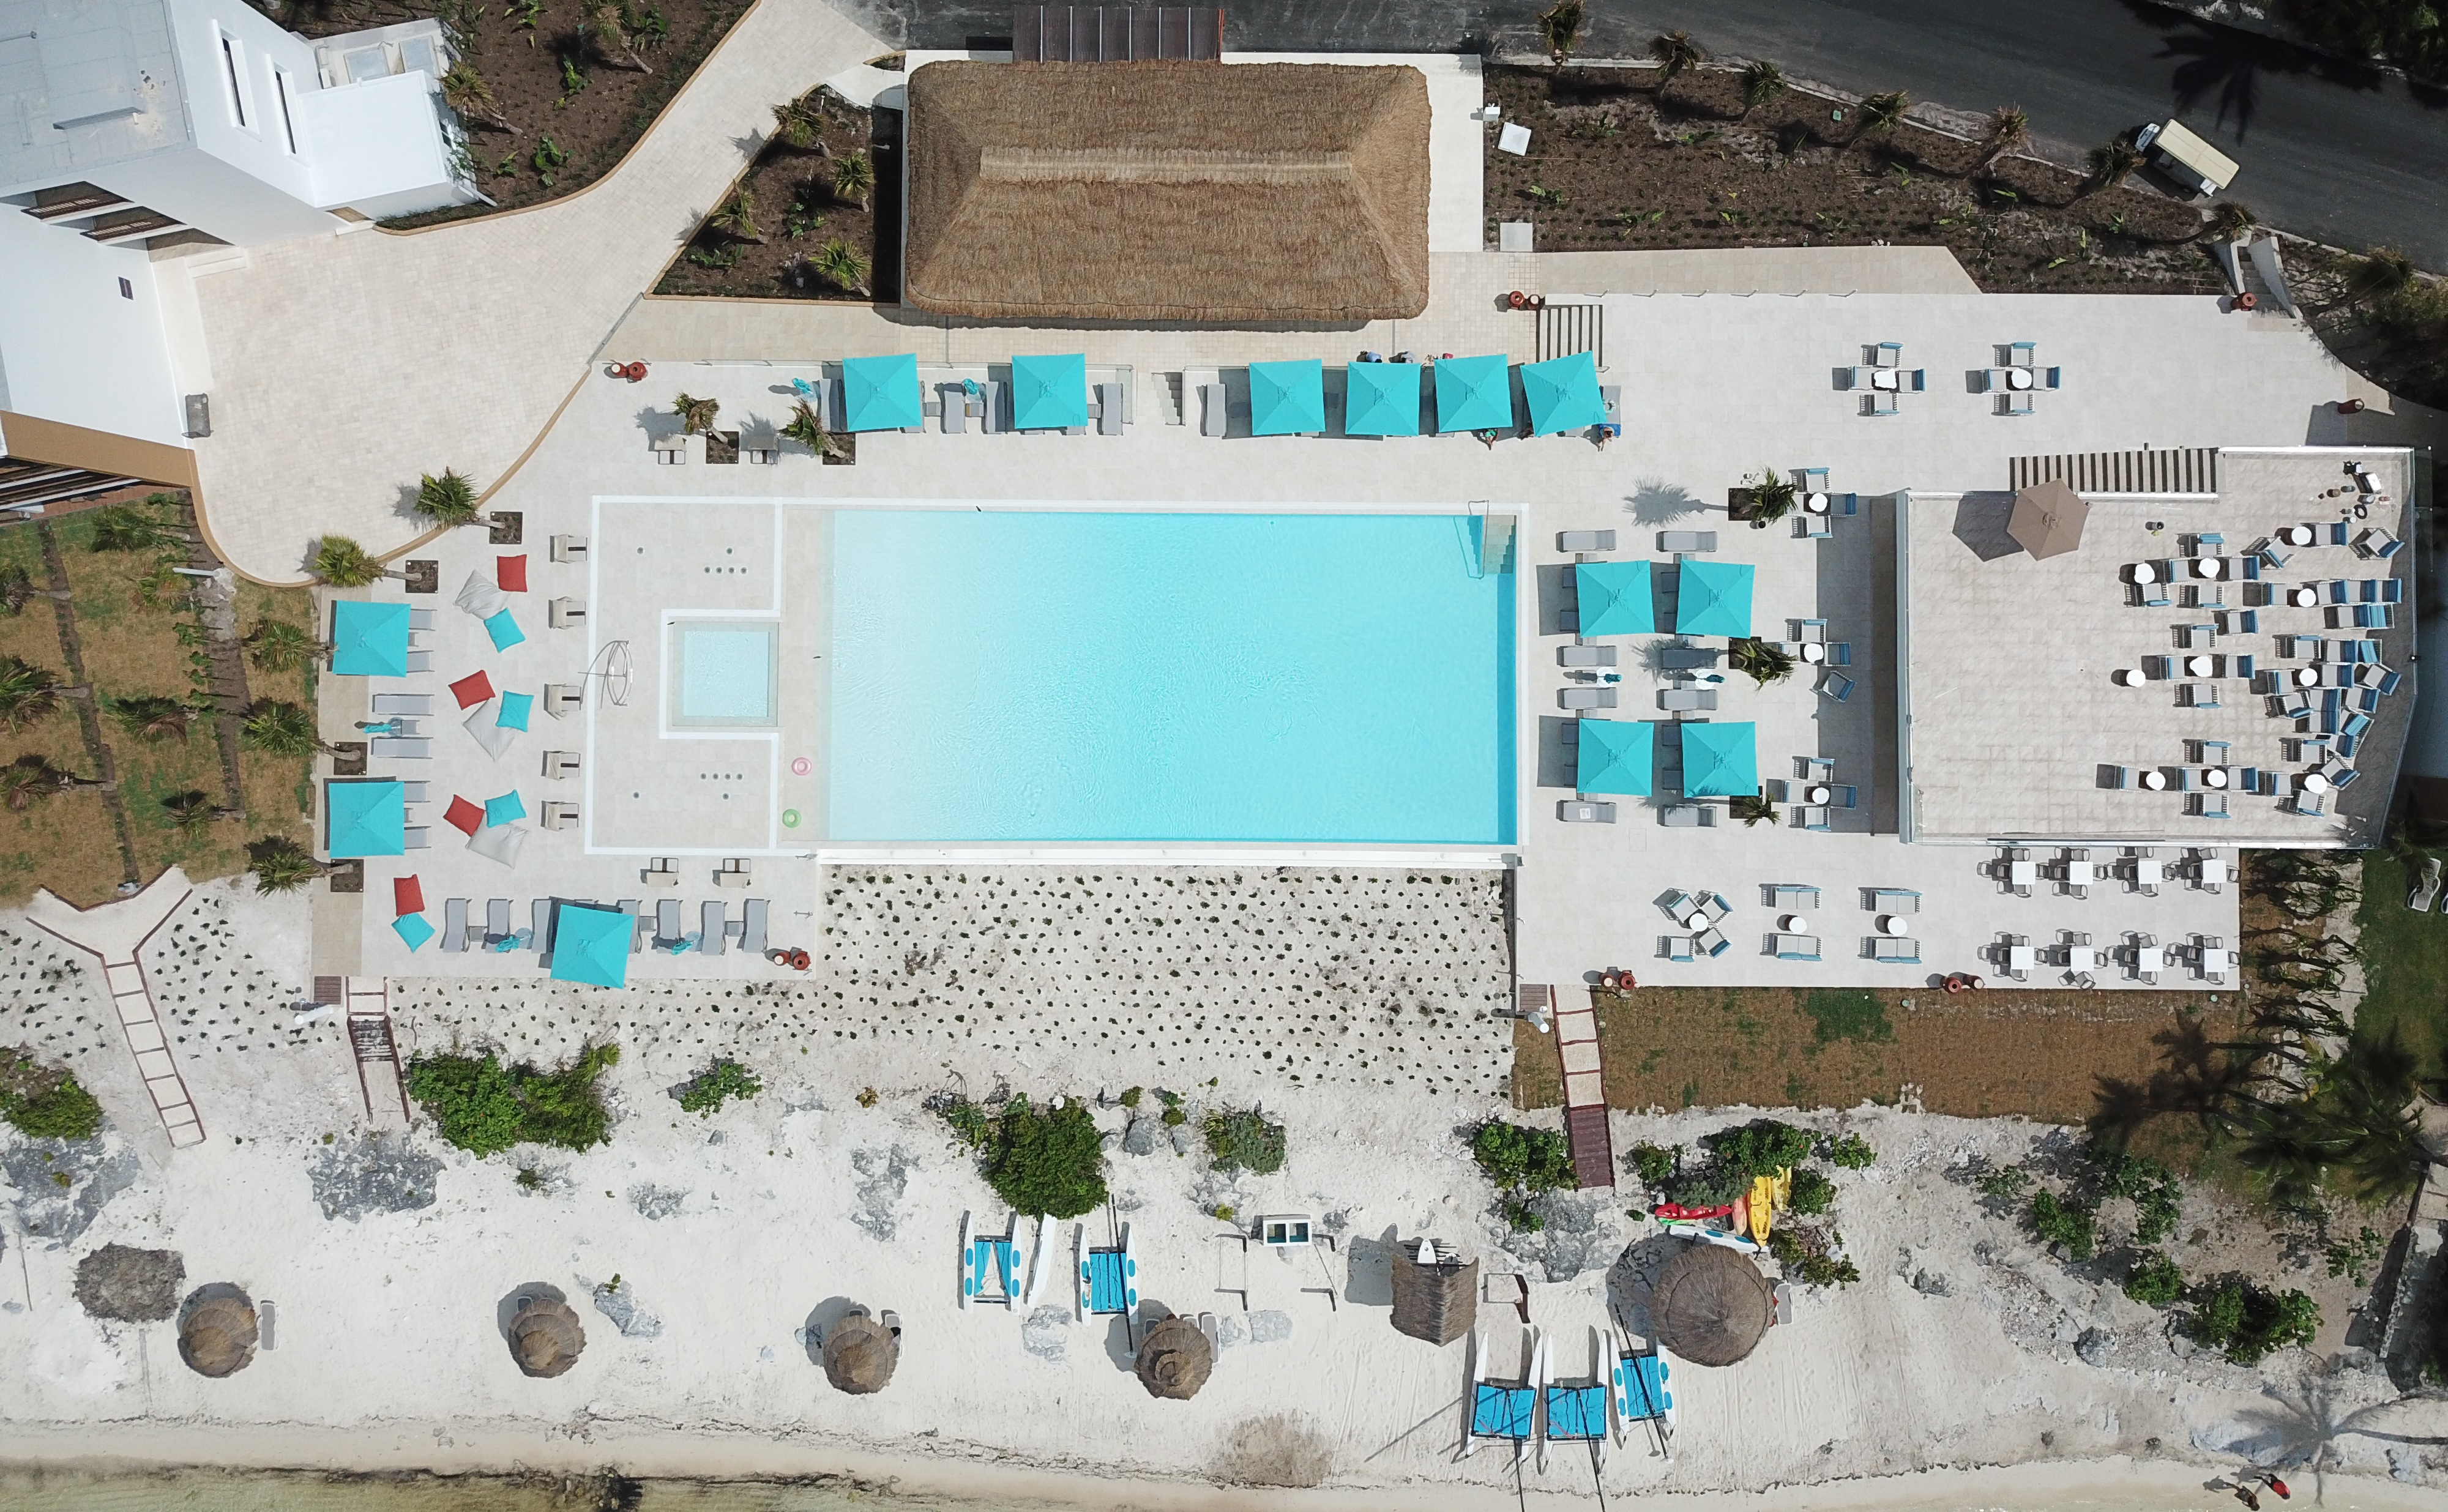 Club Med Cancun Yucatan Aguamarina Expansion Overview.jpg